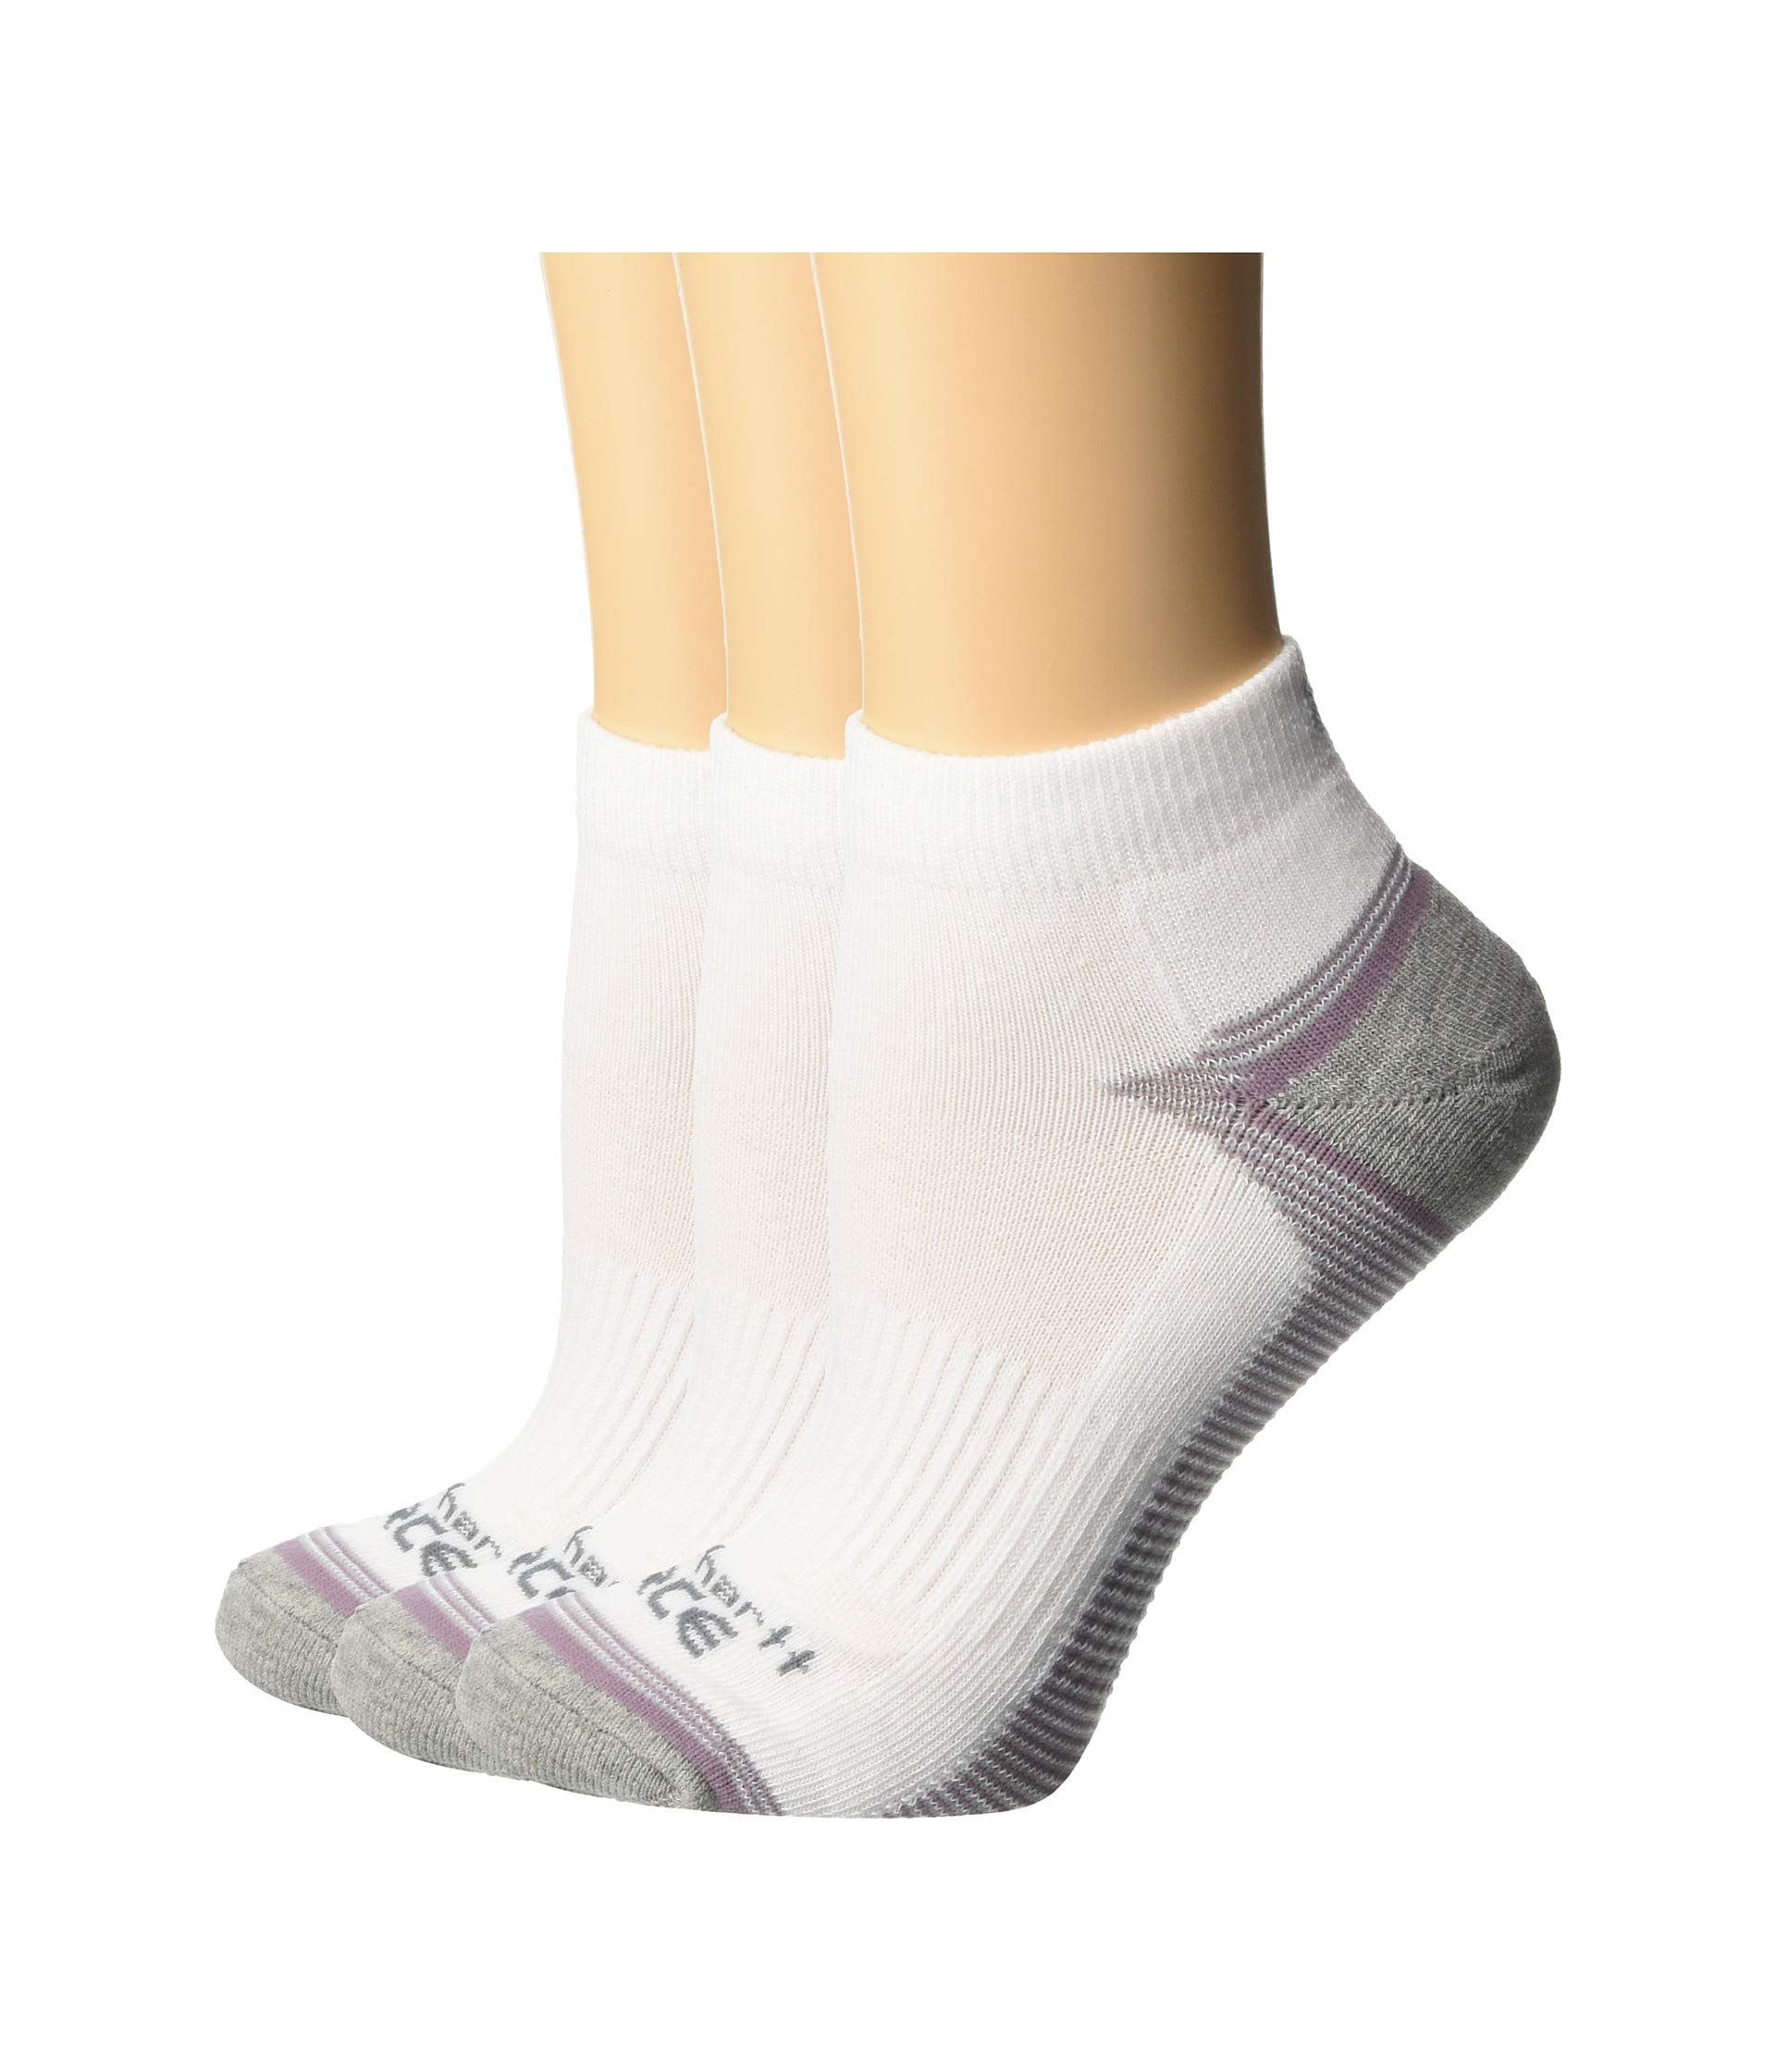 Force Cut Socks Carhartt Performace 3 pair White Low Work 7PRaq